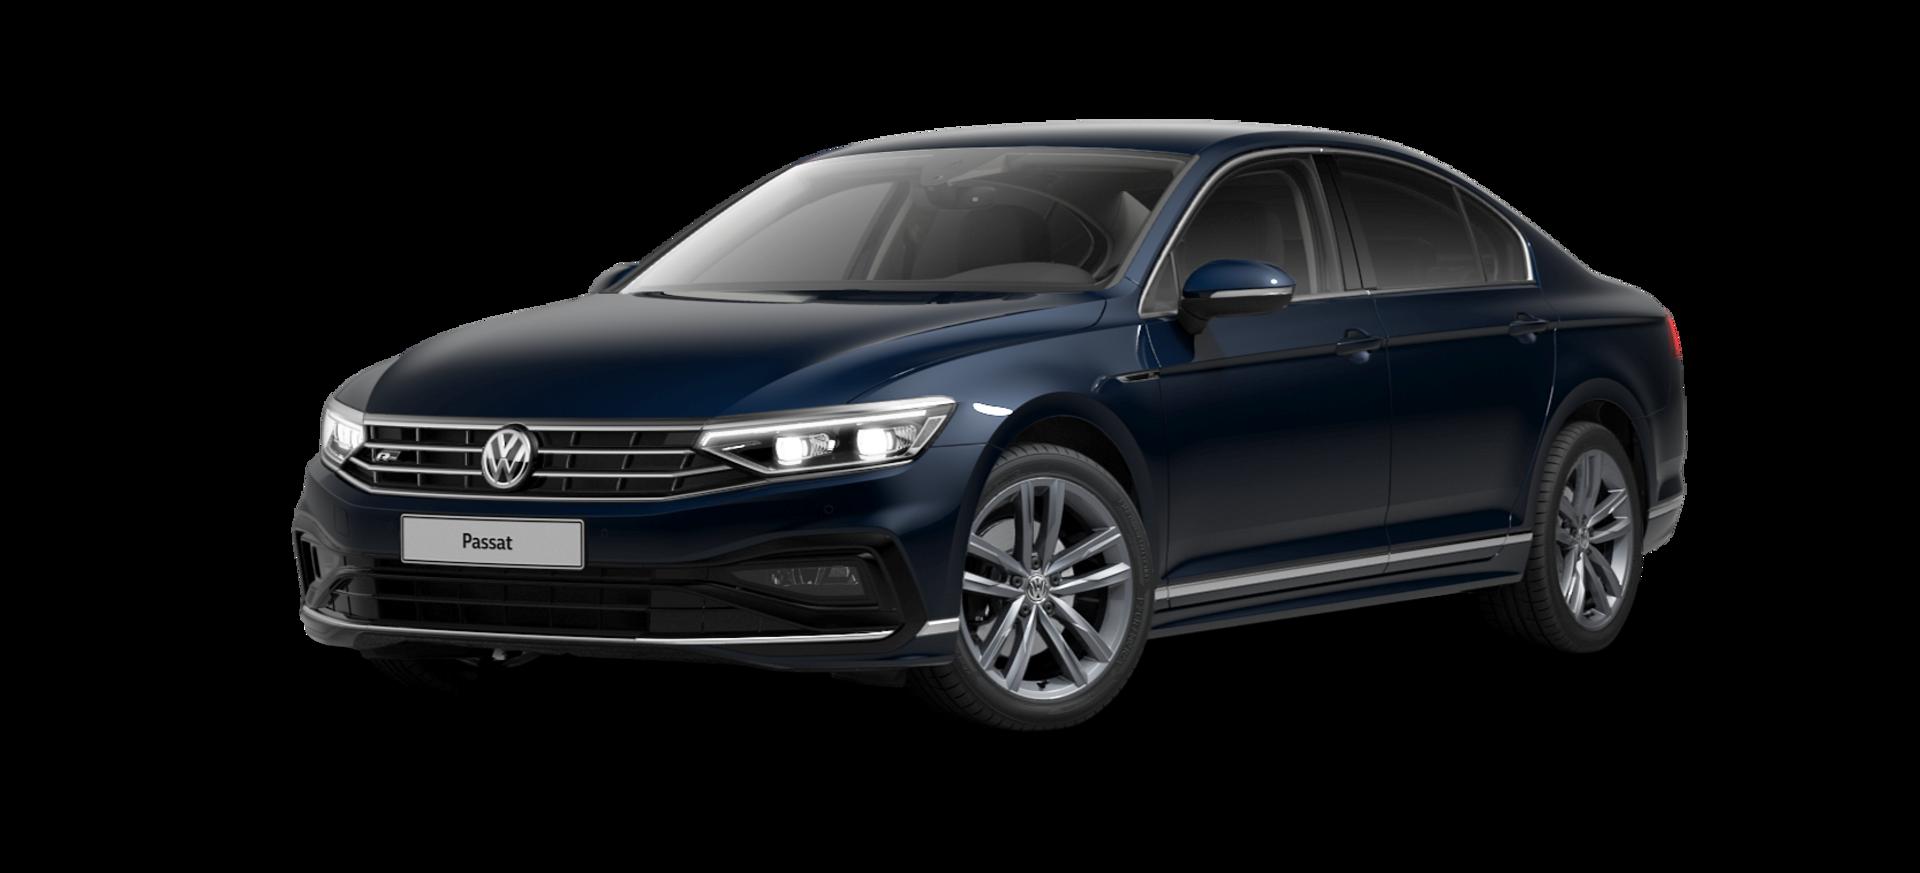 Noul Passat Highline 2.0 TDI DSG / 190 CP/140 kW / 2.0l / Direct Shift Gearbox / 4-usi : Volkswagen Passat